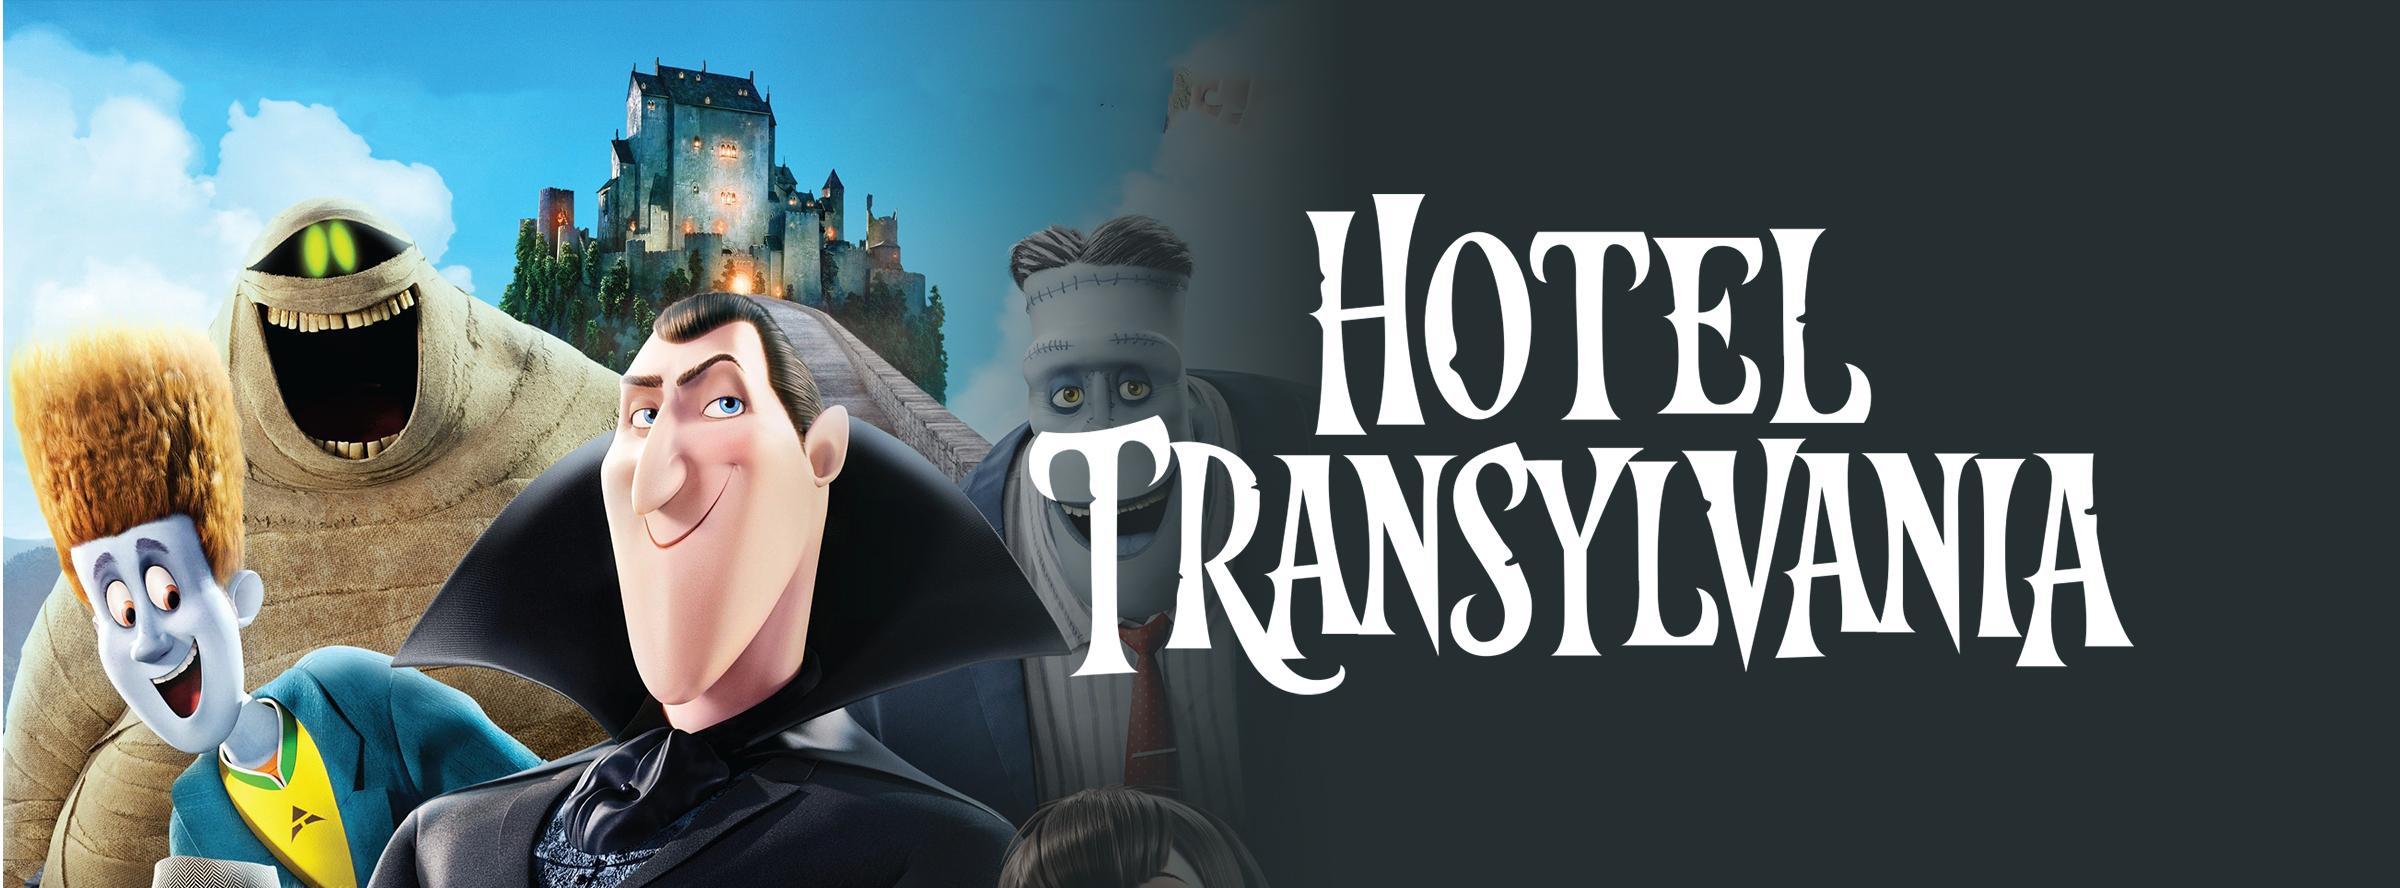 Slider Image for Hotel Transylvania